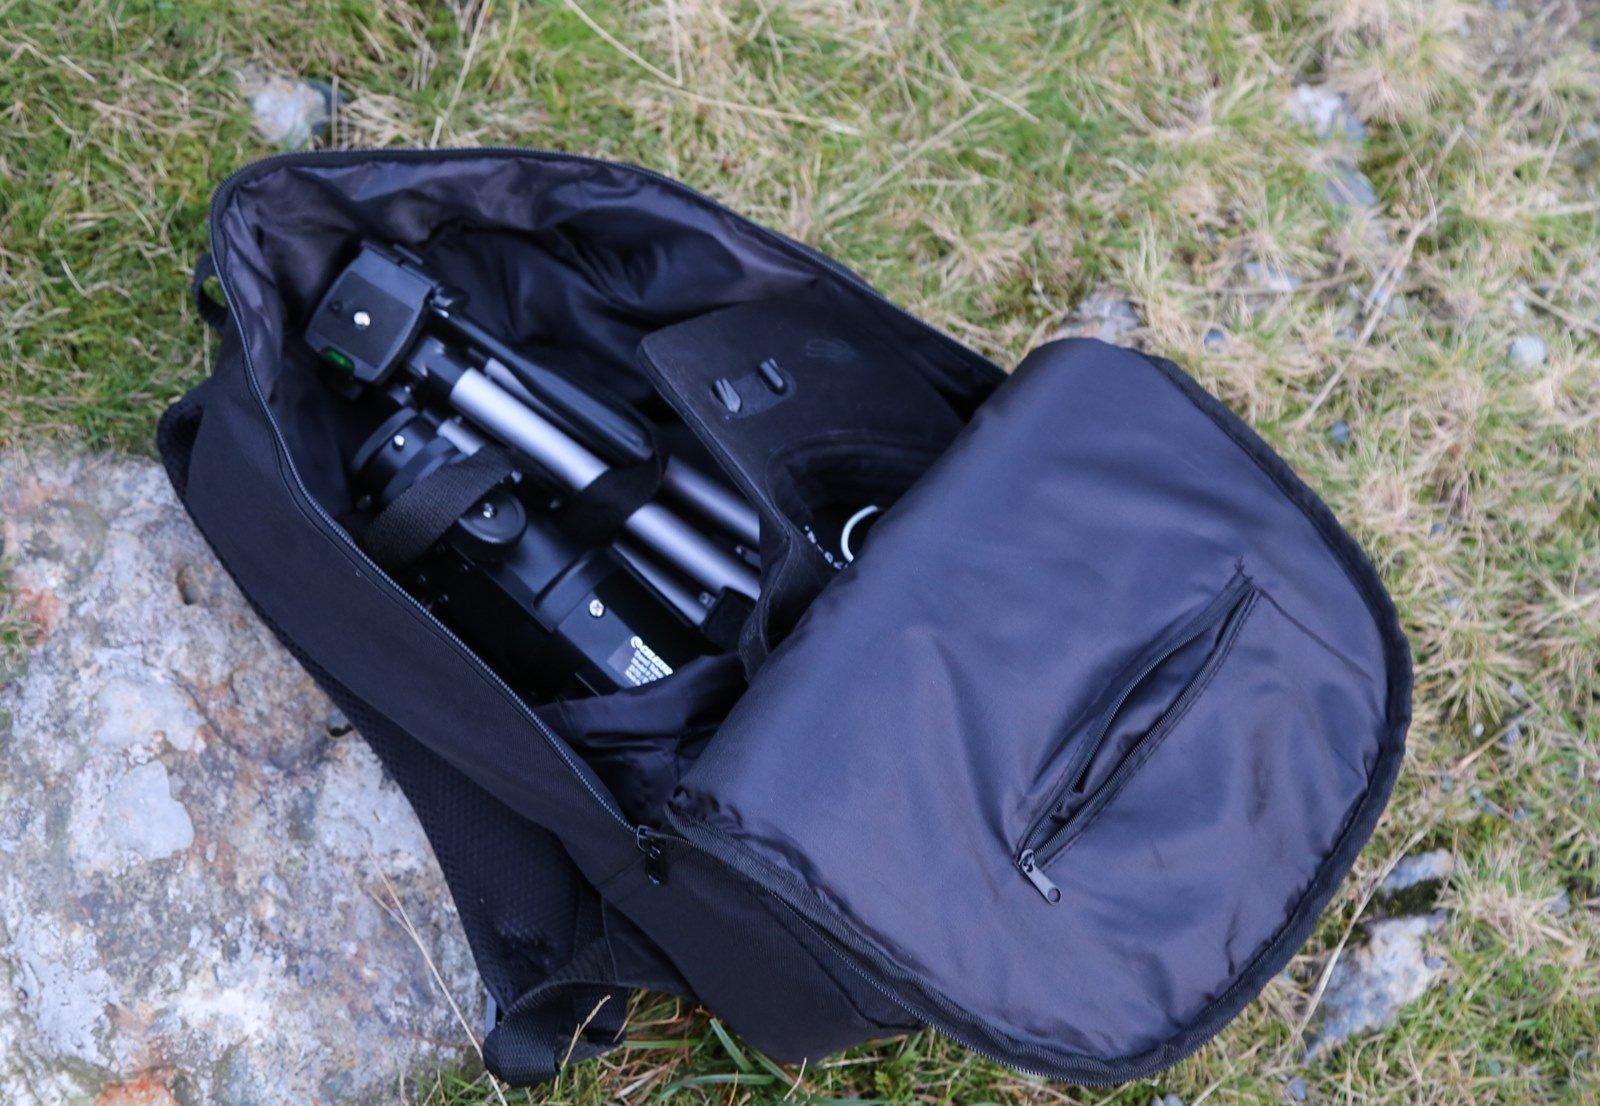 Celestron travel scope portable telescope shopping bin